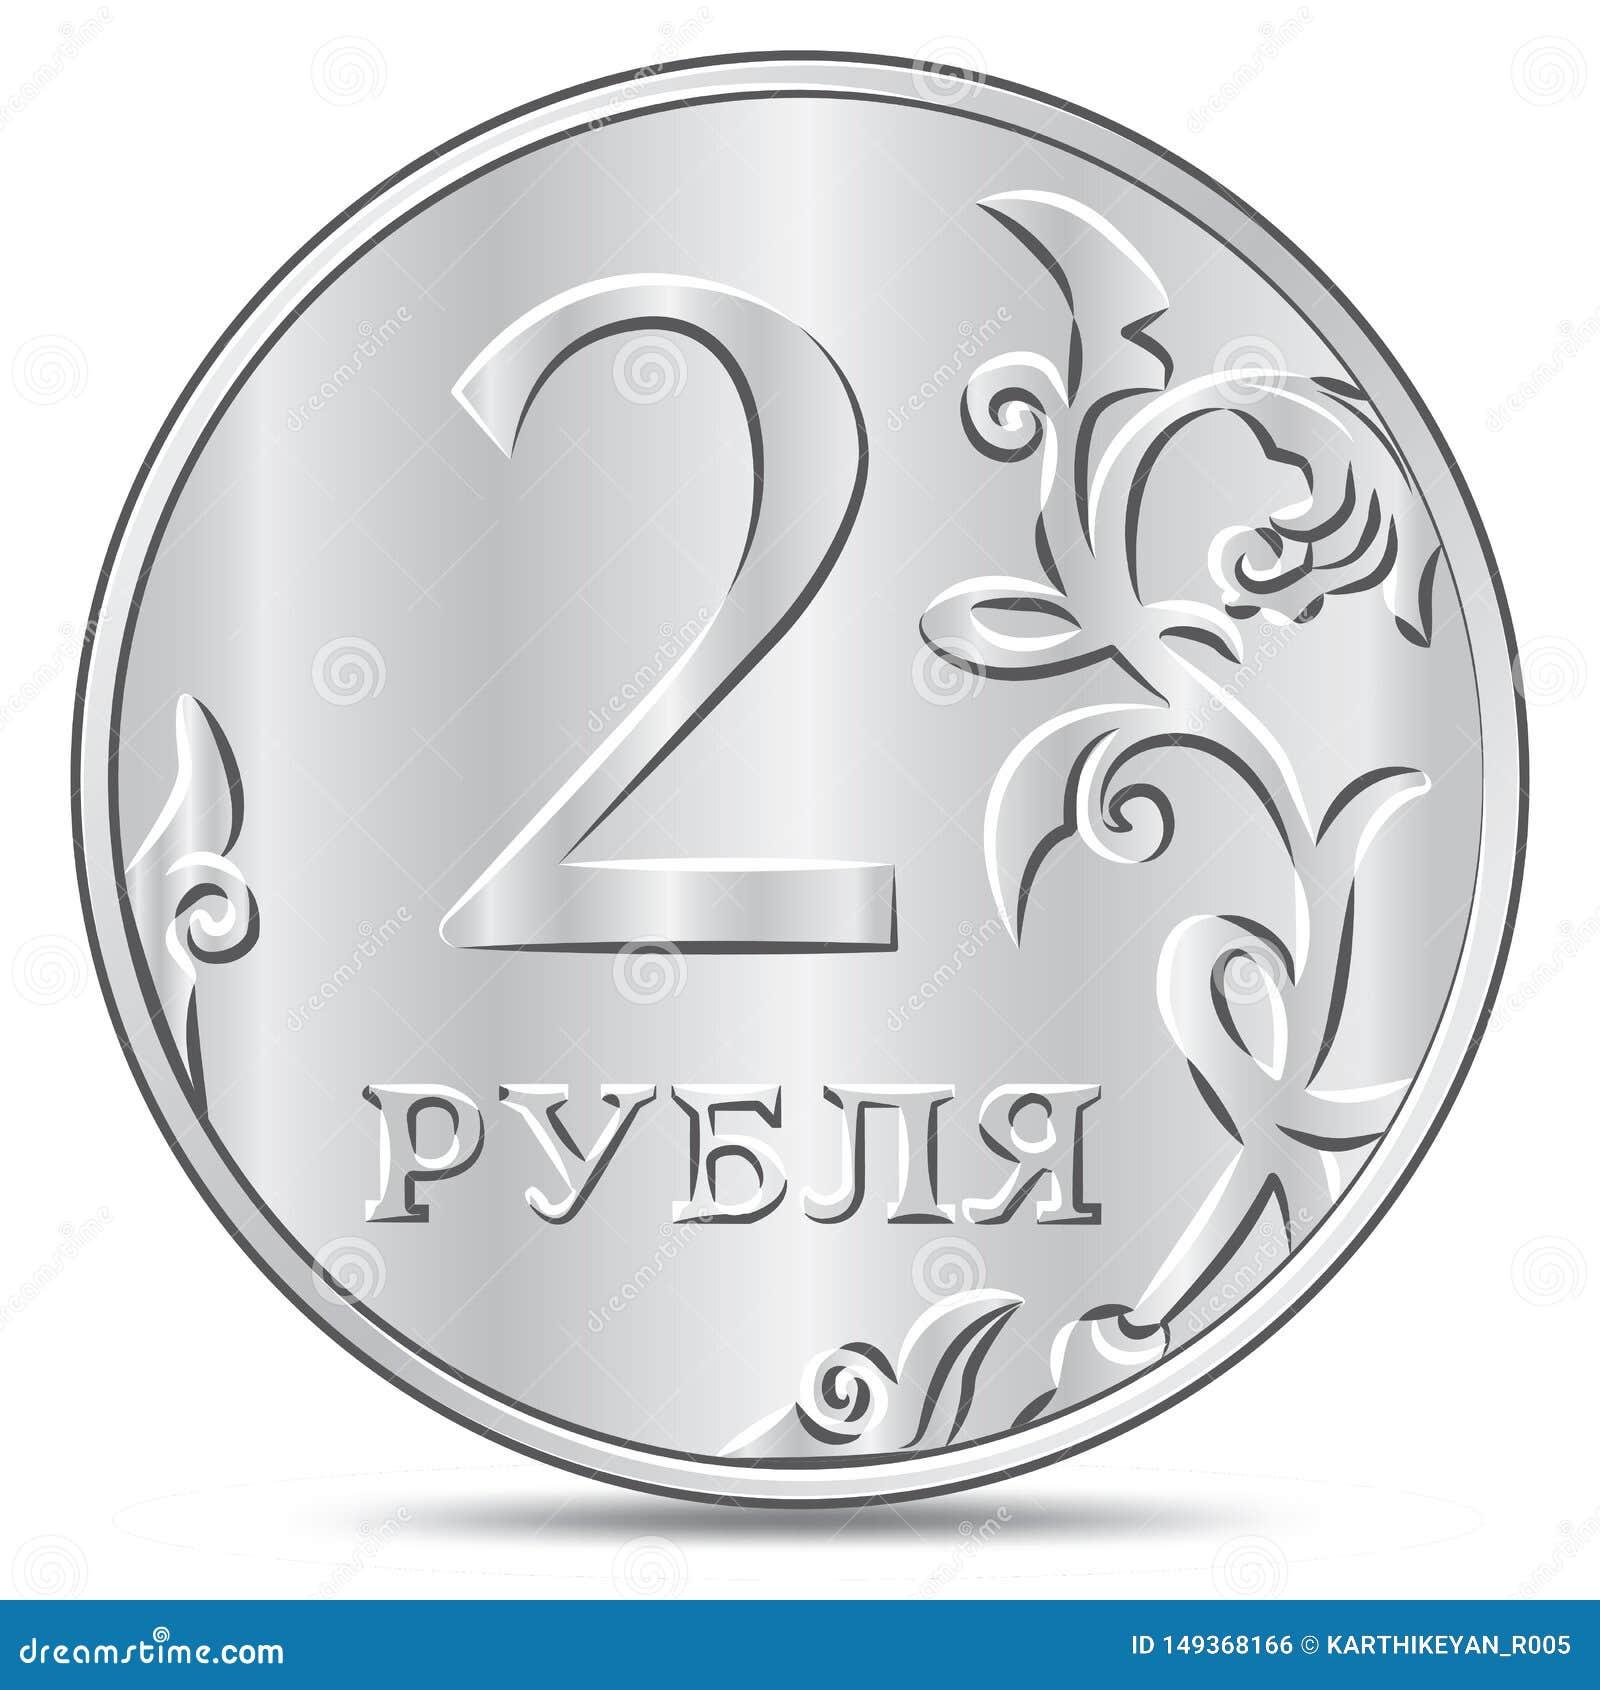 Twee die roebelsmuntstuk op witte achtergrond wordt ge?soleerd